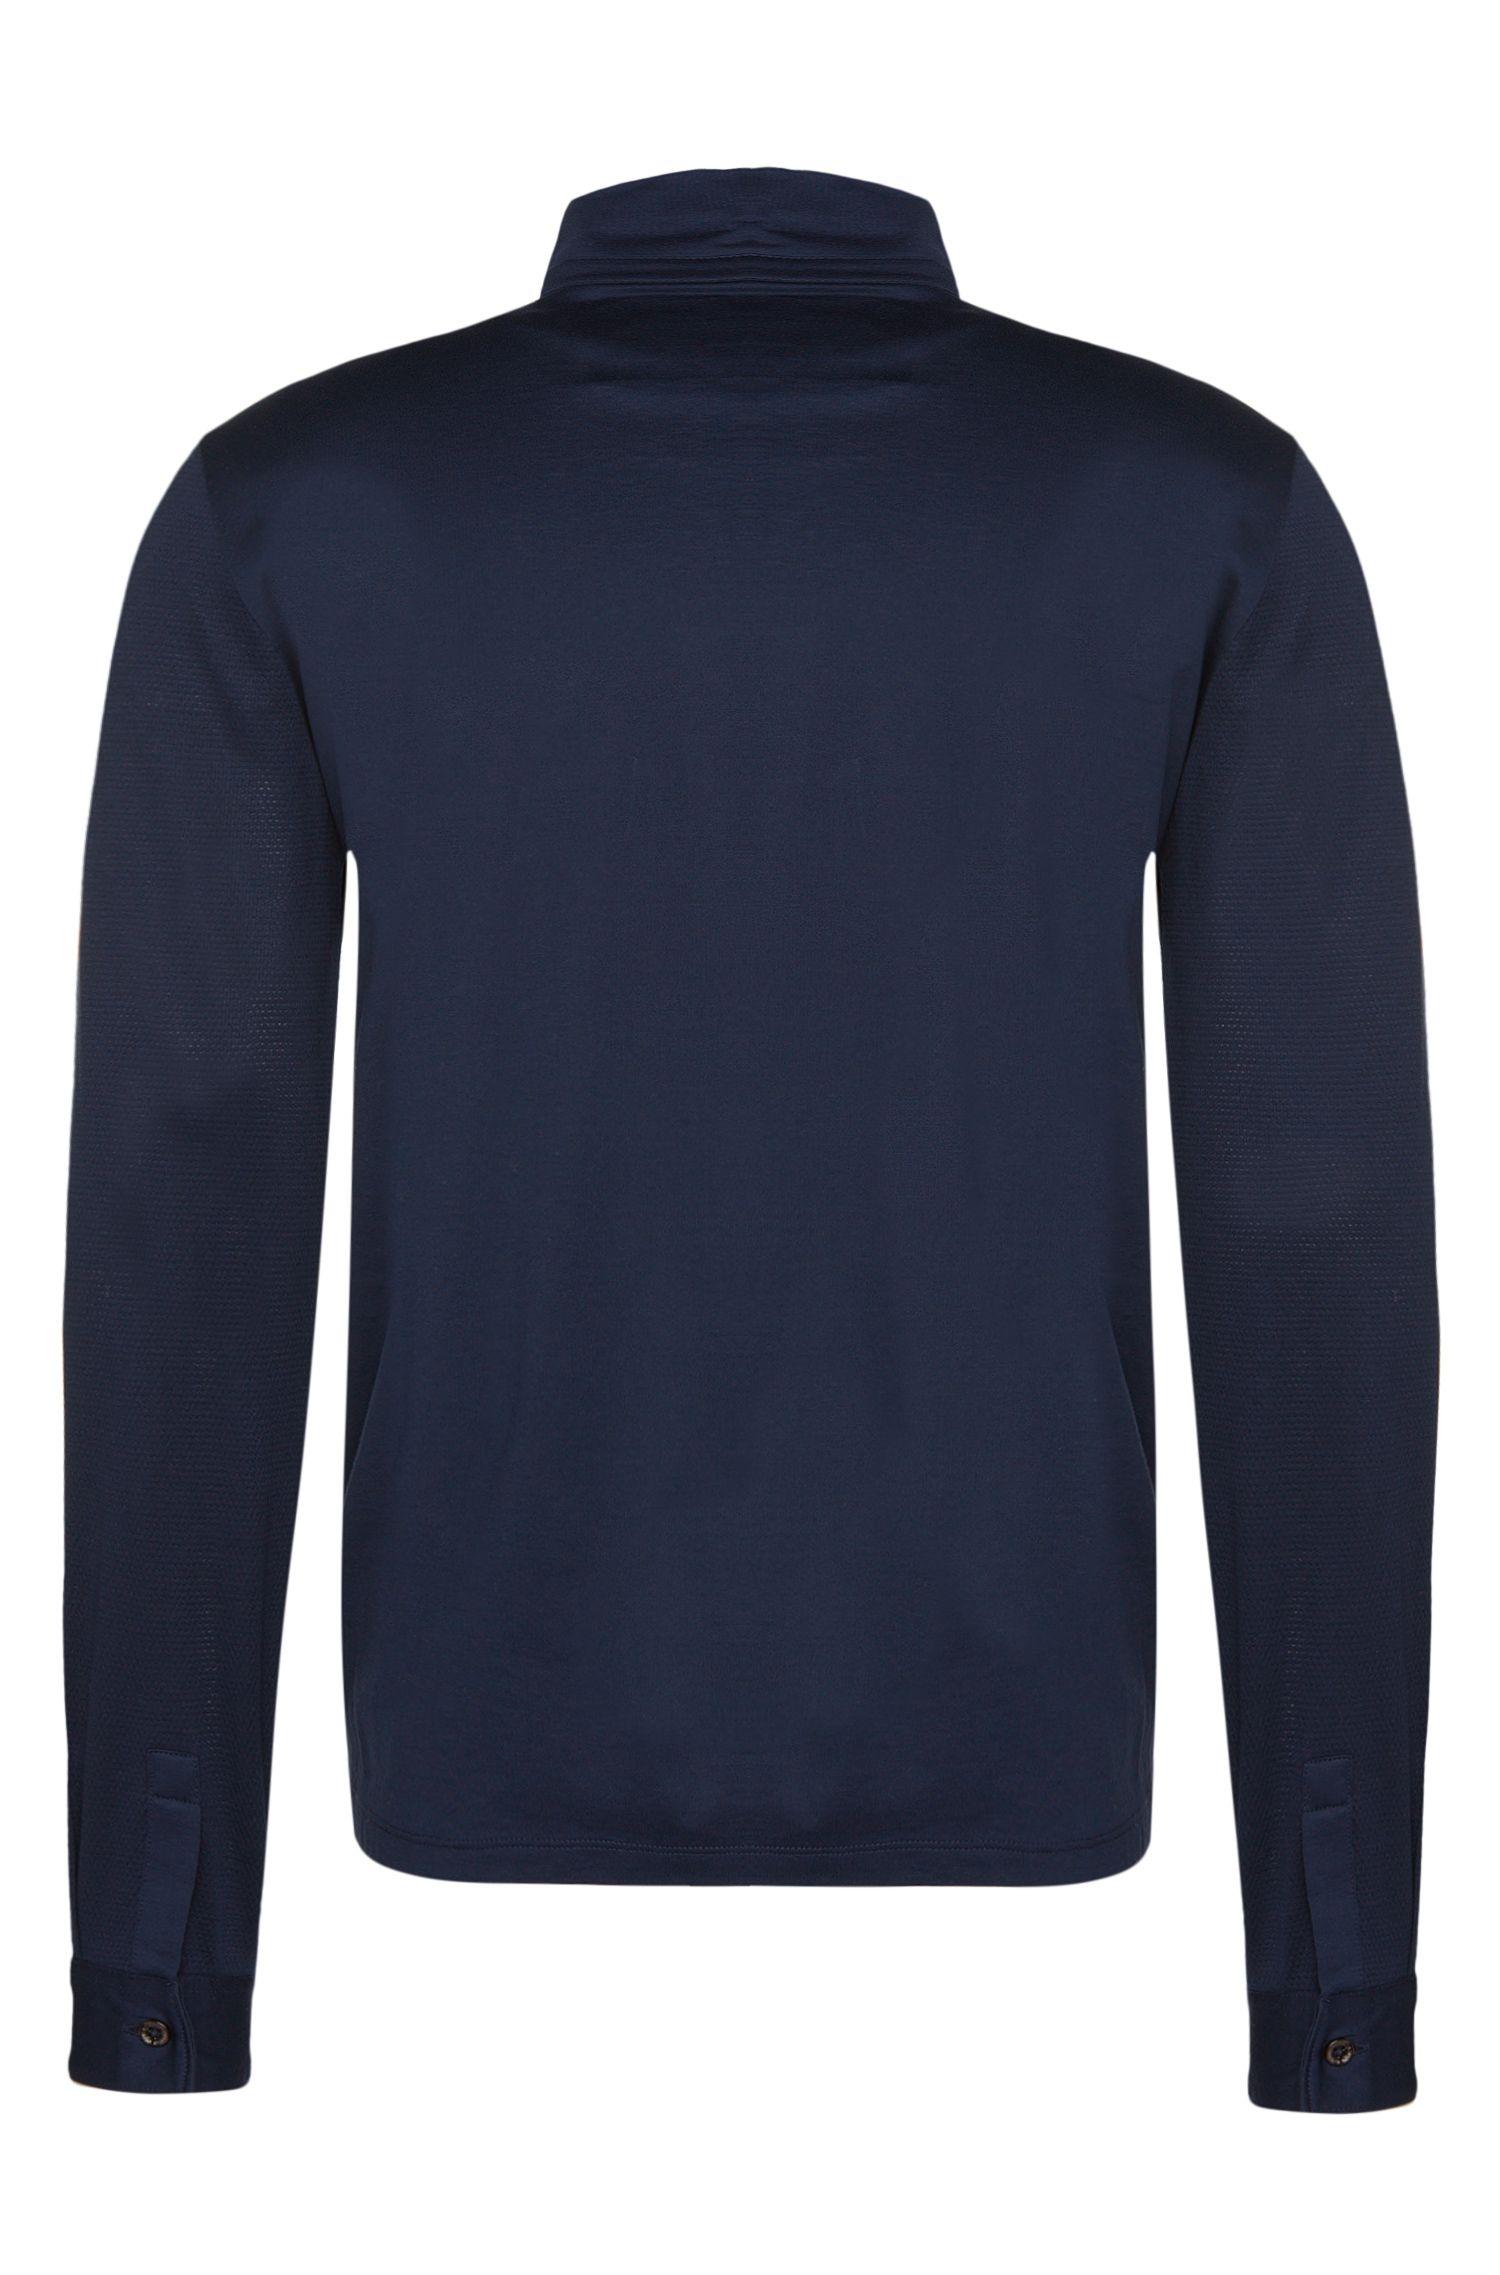 Regular-Fit Longsleeve-Poloshirt aus Baumwolle: 'Pickell 02'